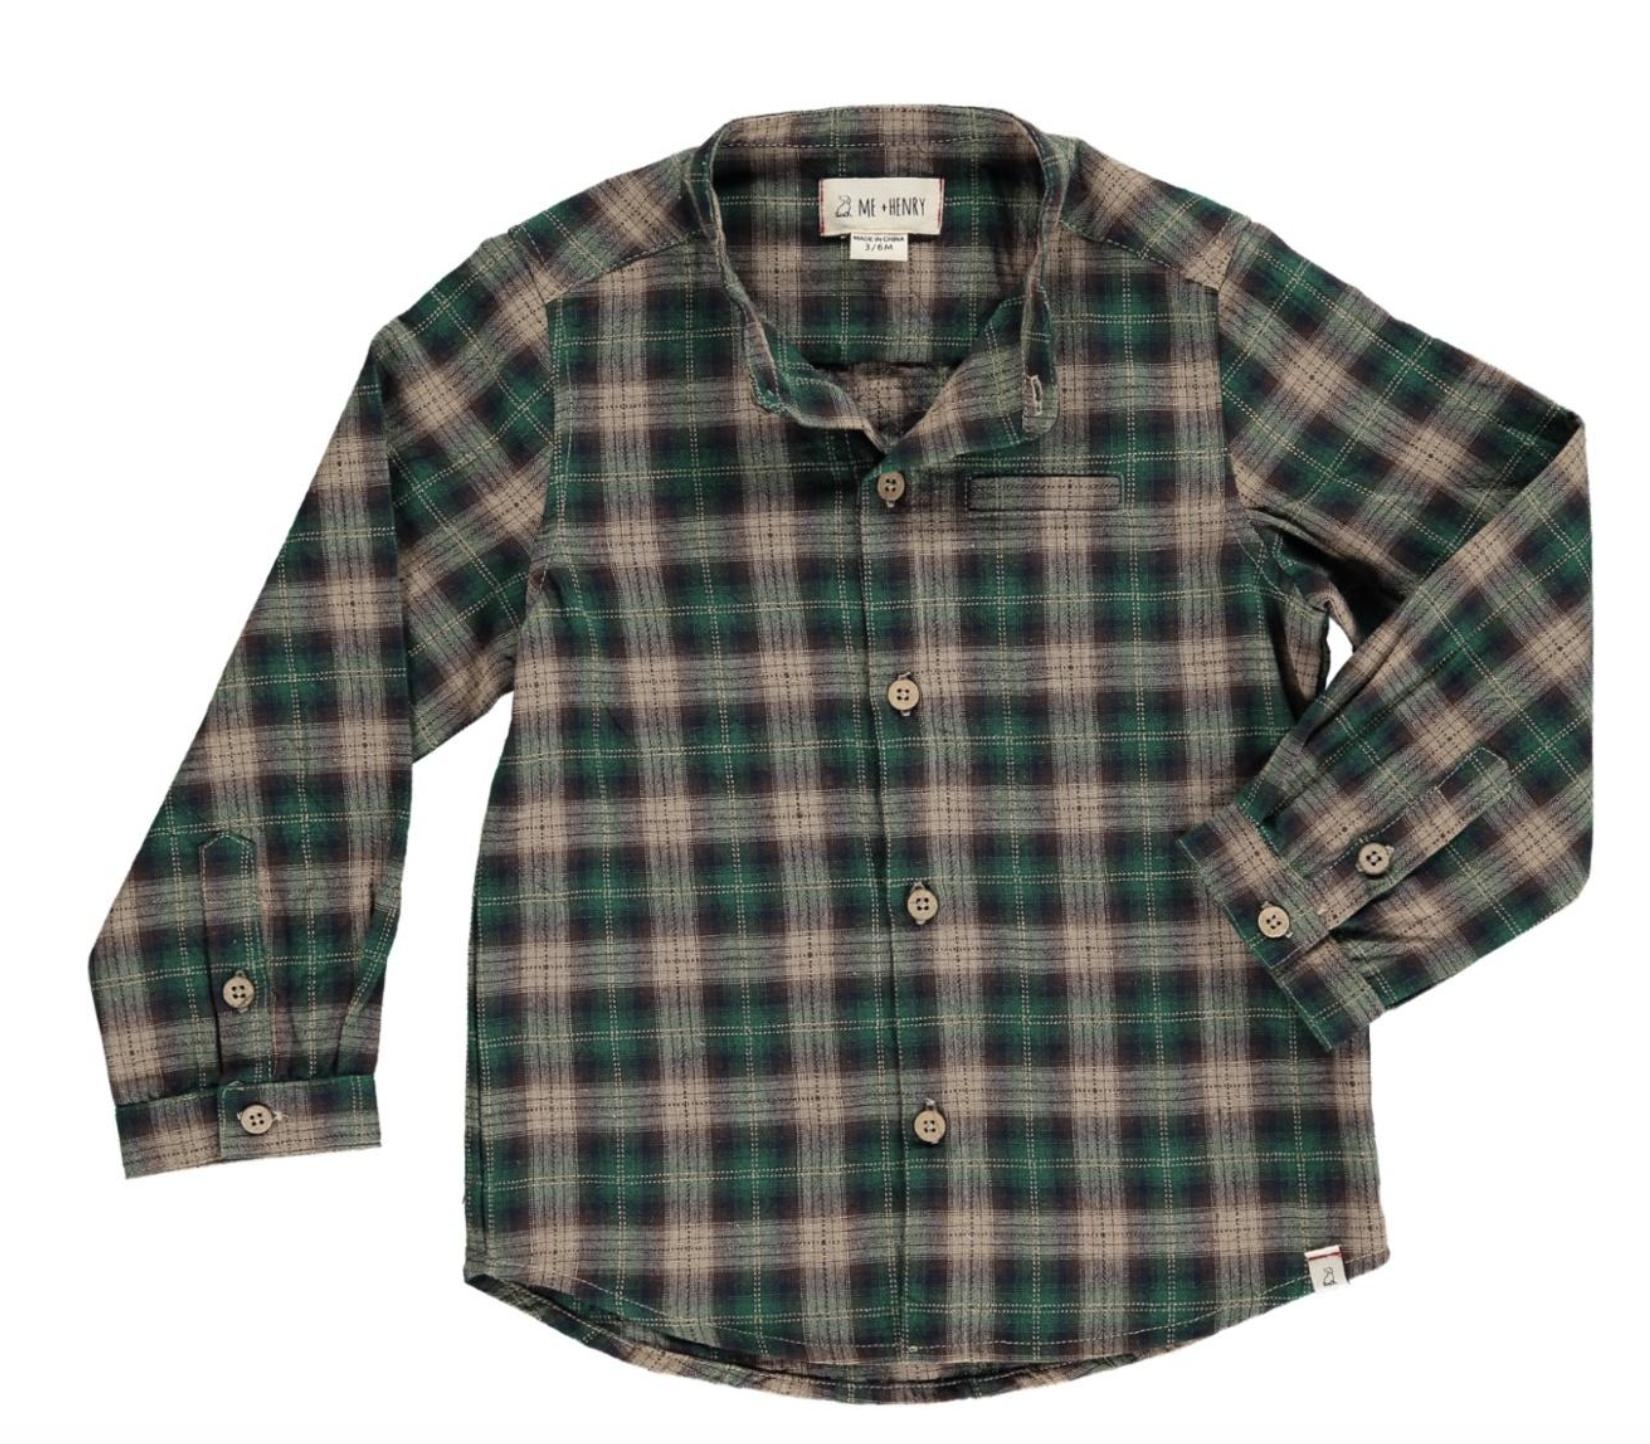 Me + Henry Green Plaid Shirt, Boys